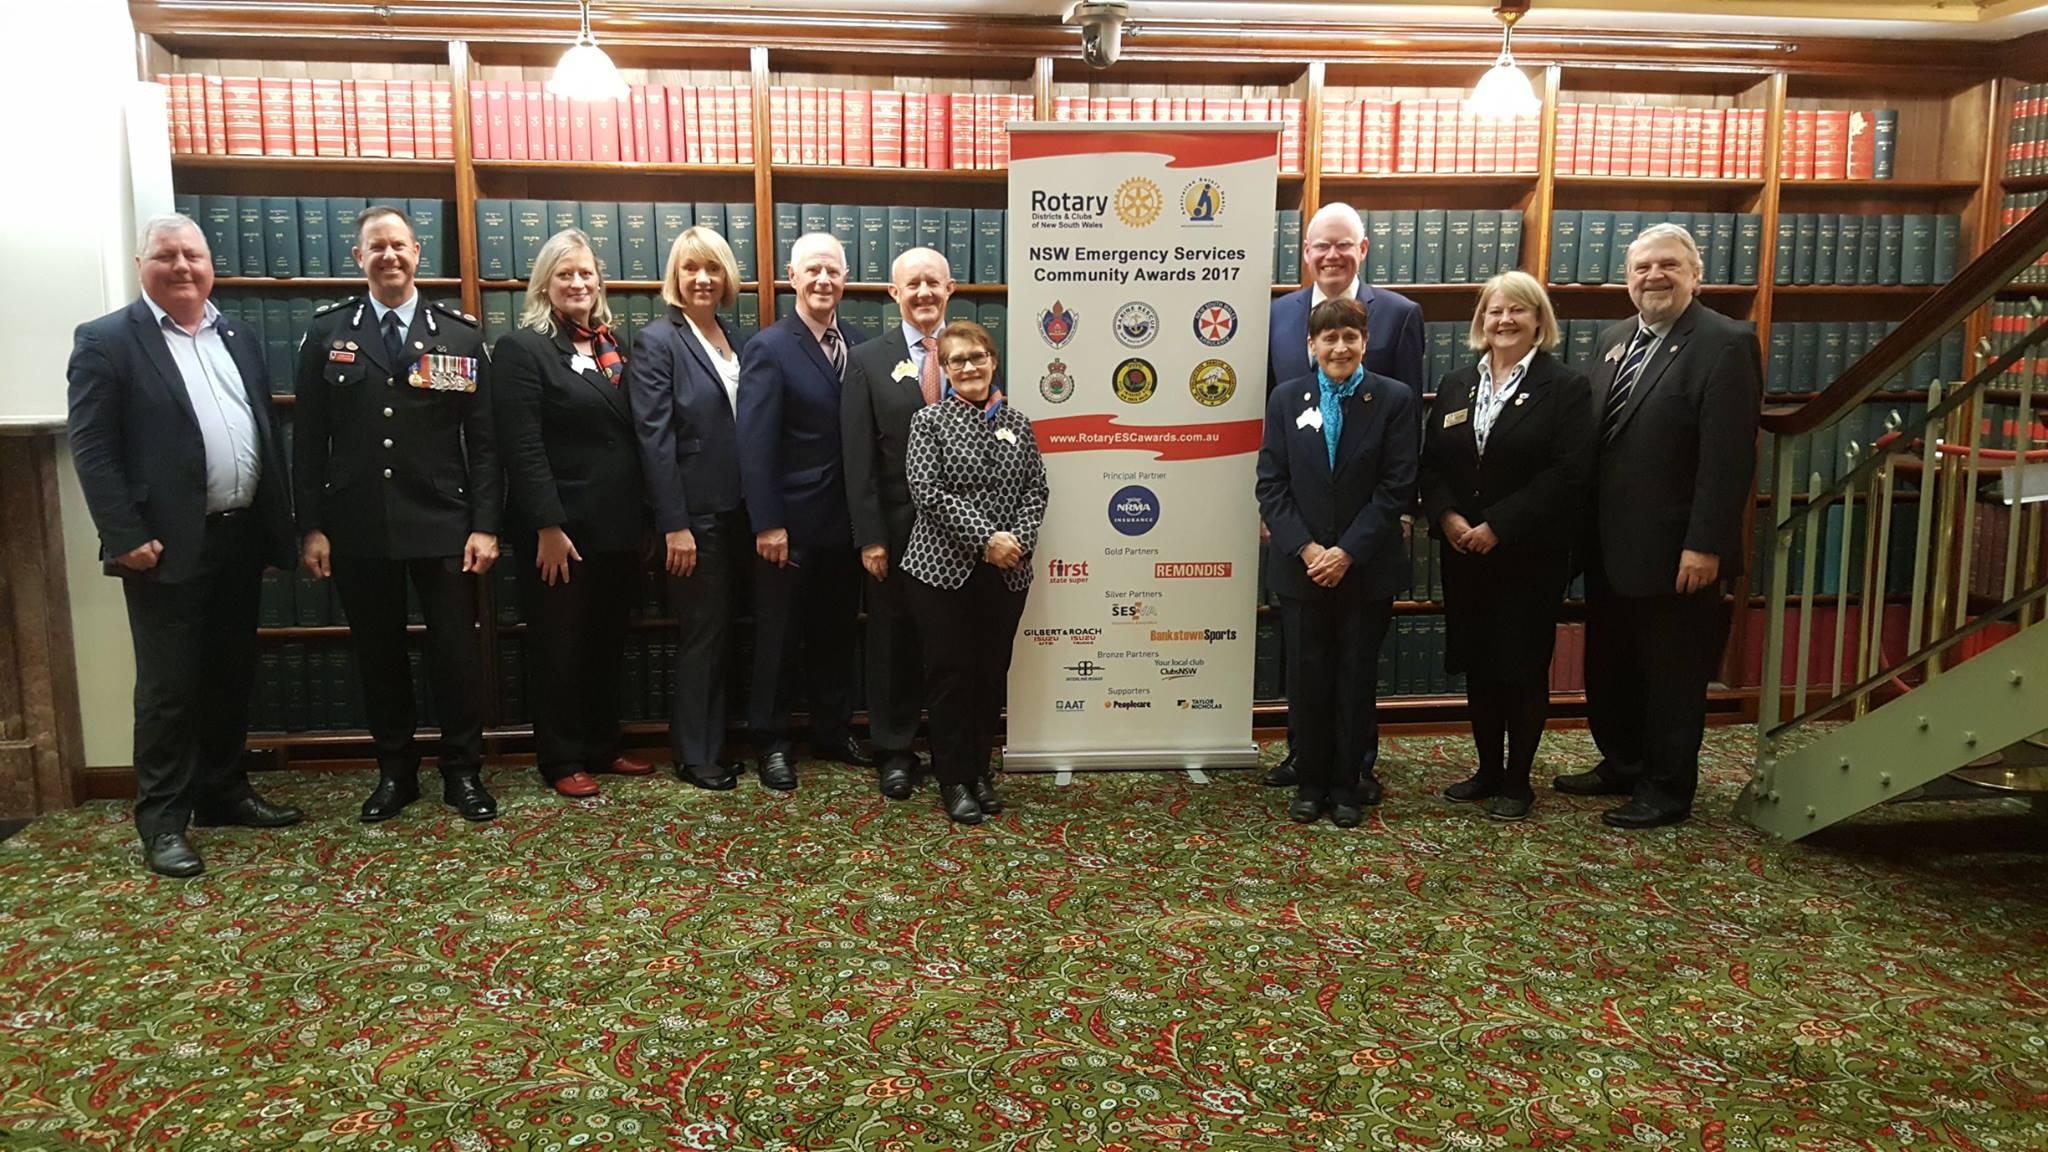 Rotary NSW Emergency Services Community Awards 8